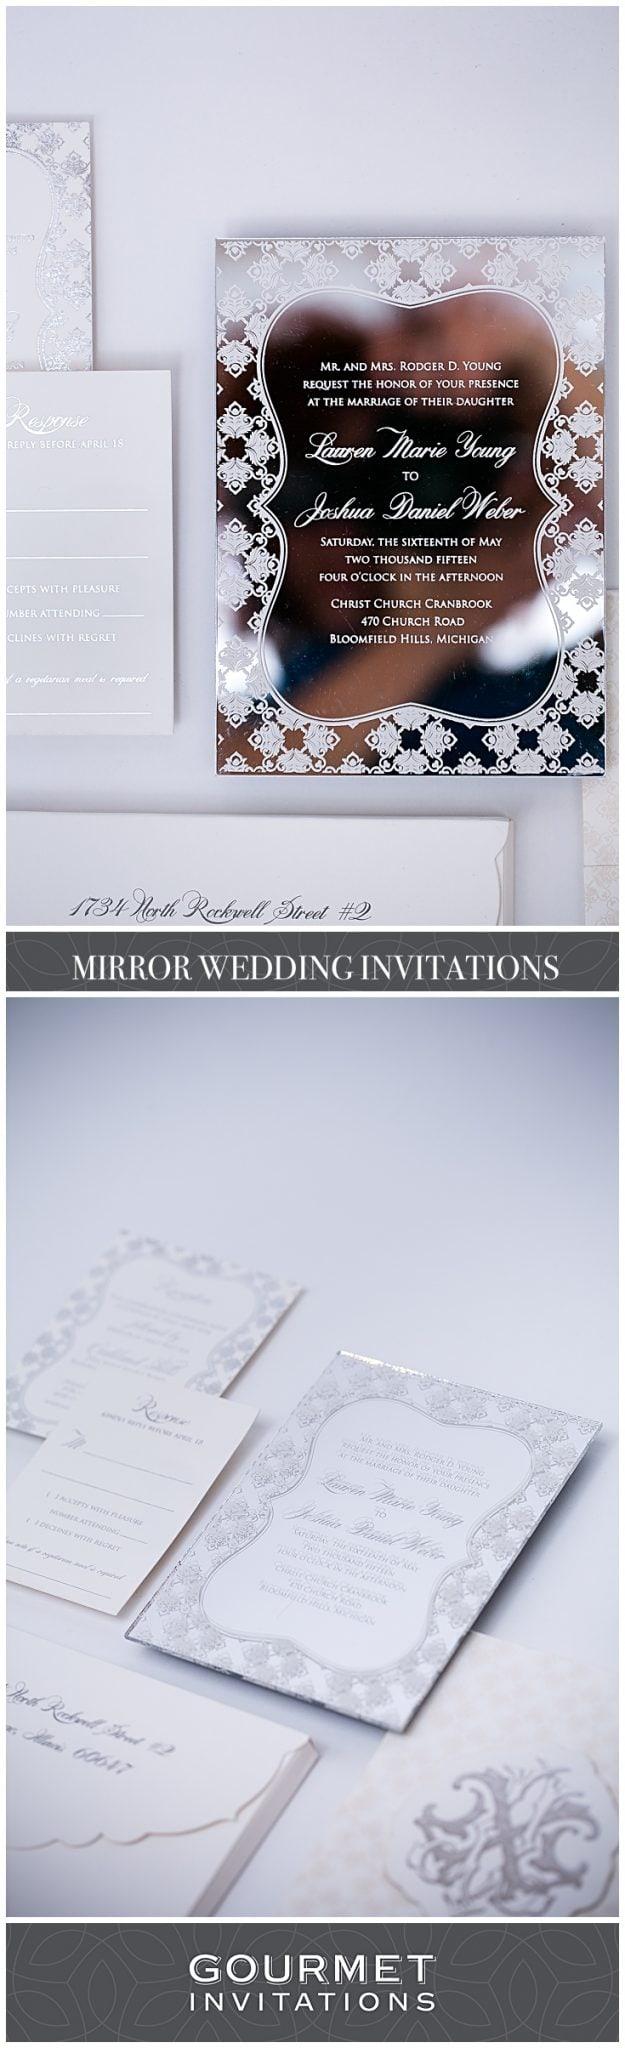 mirror-wedding-invitations_0002